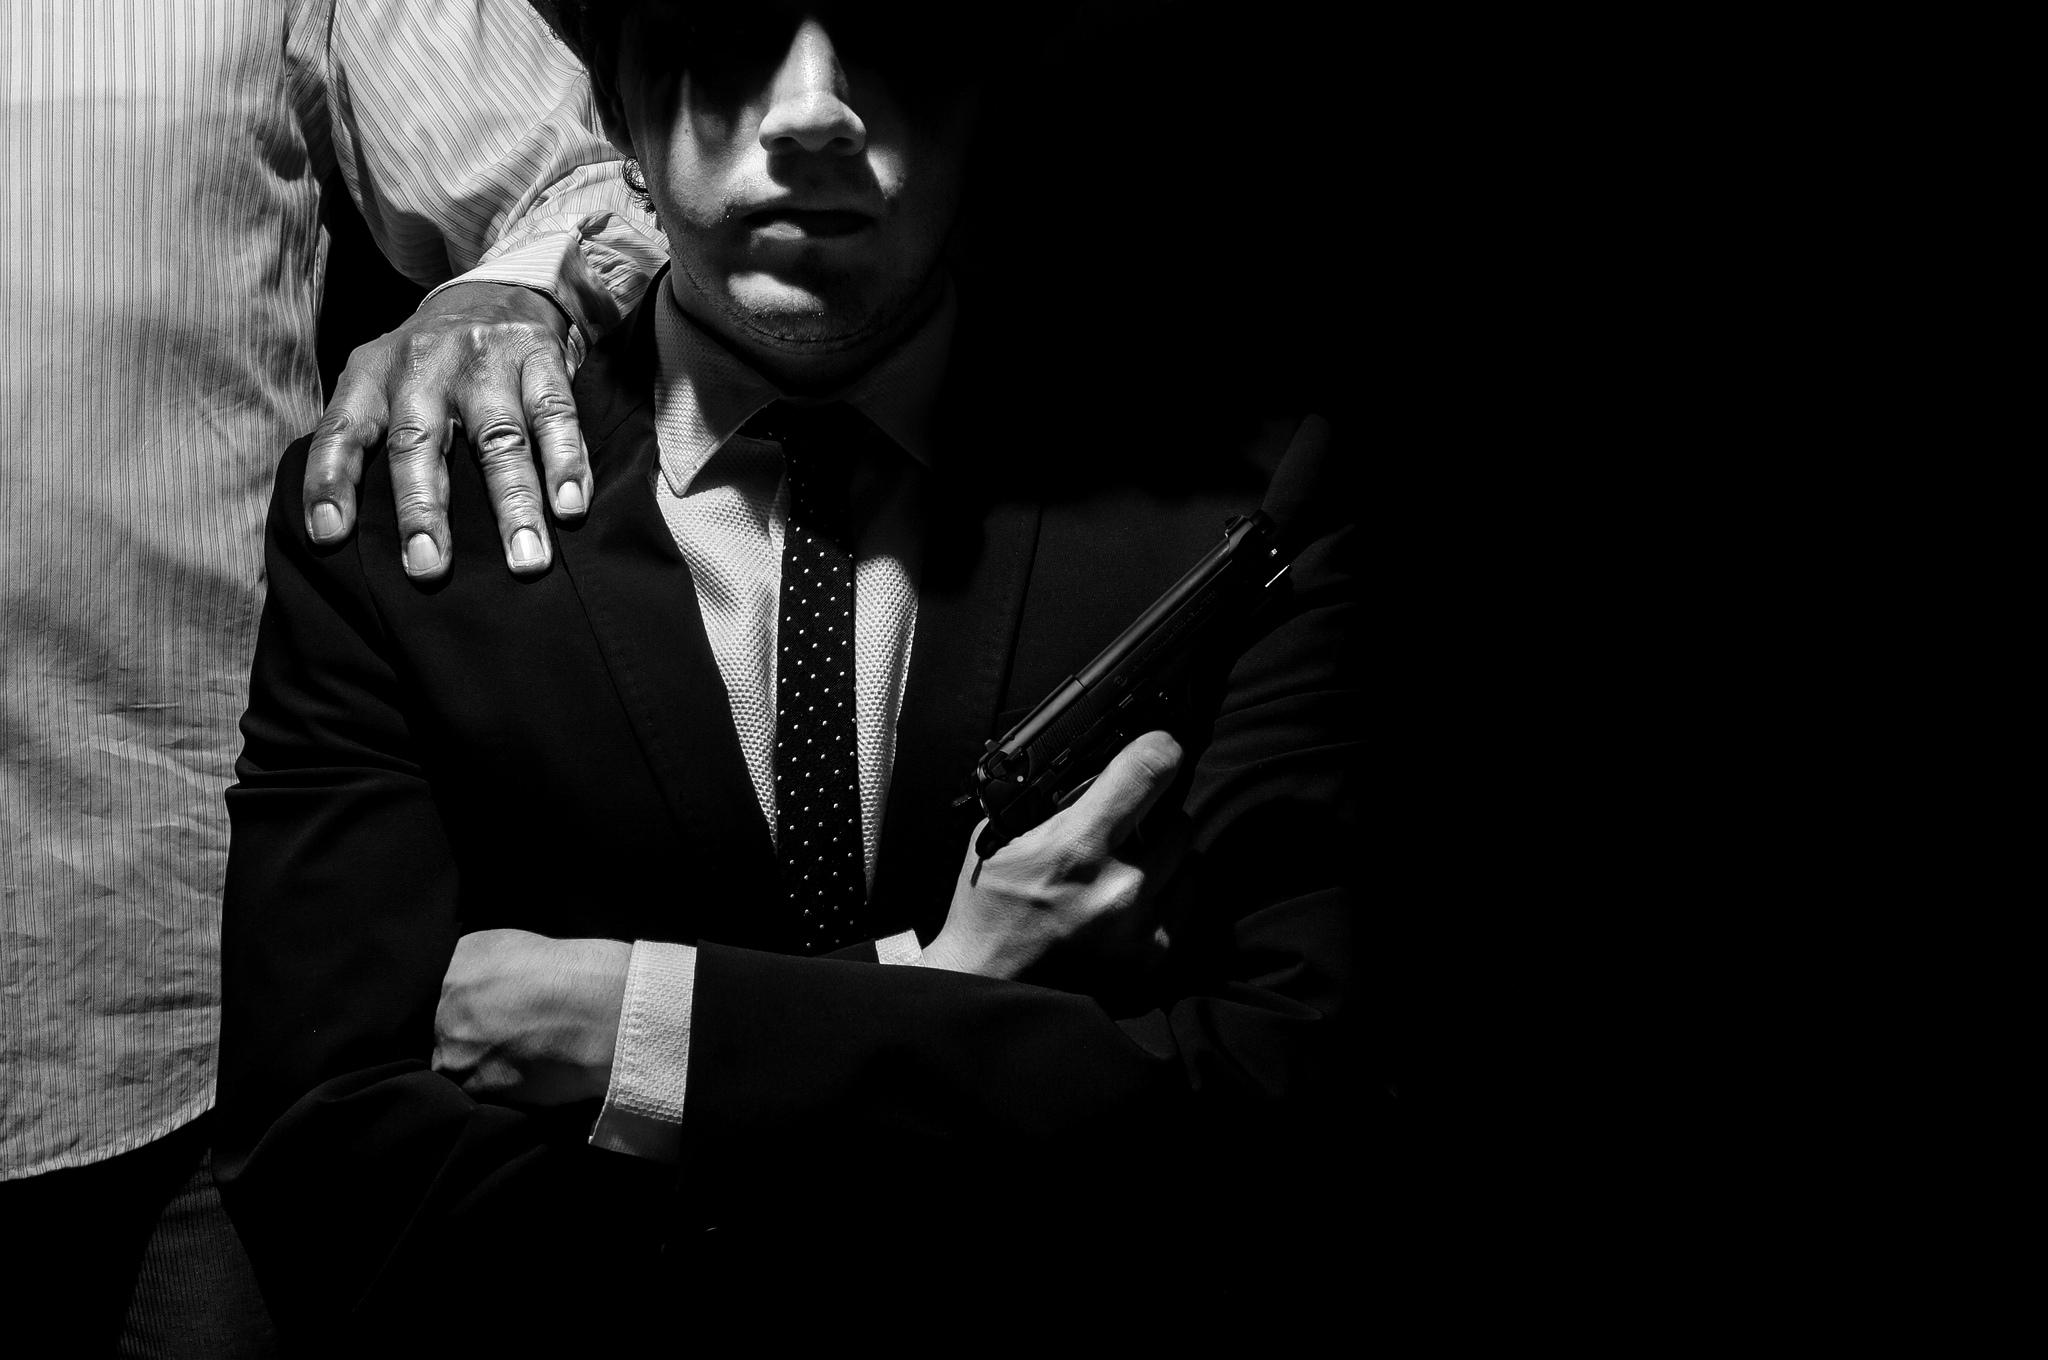 Mafias del Mundo: Ndrangheta by Eneas De Troya on Flickr (CC BY 2.0)